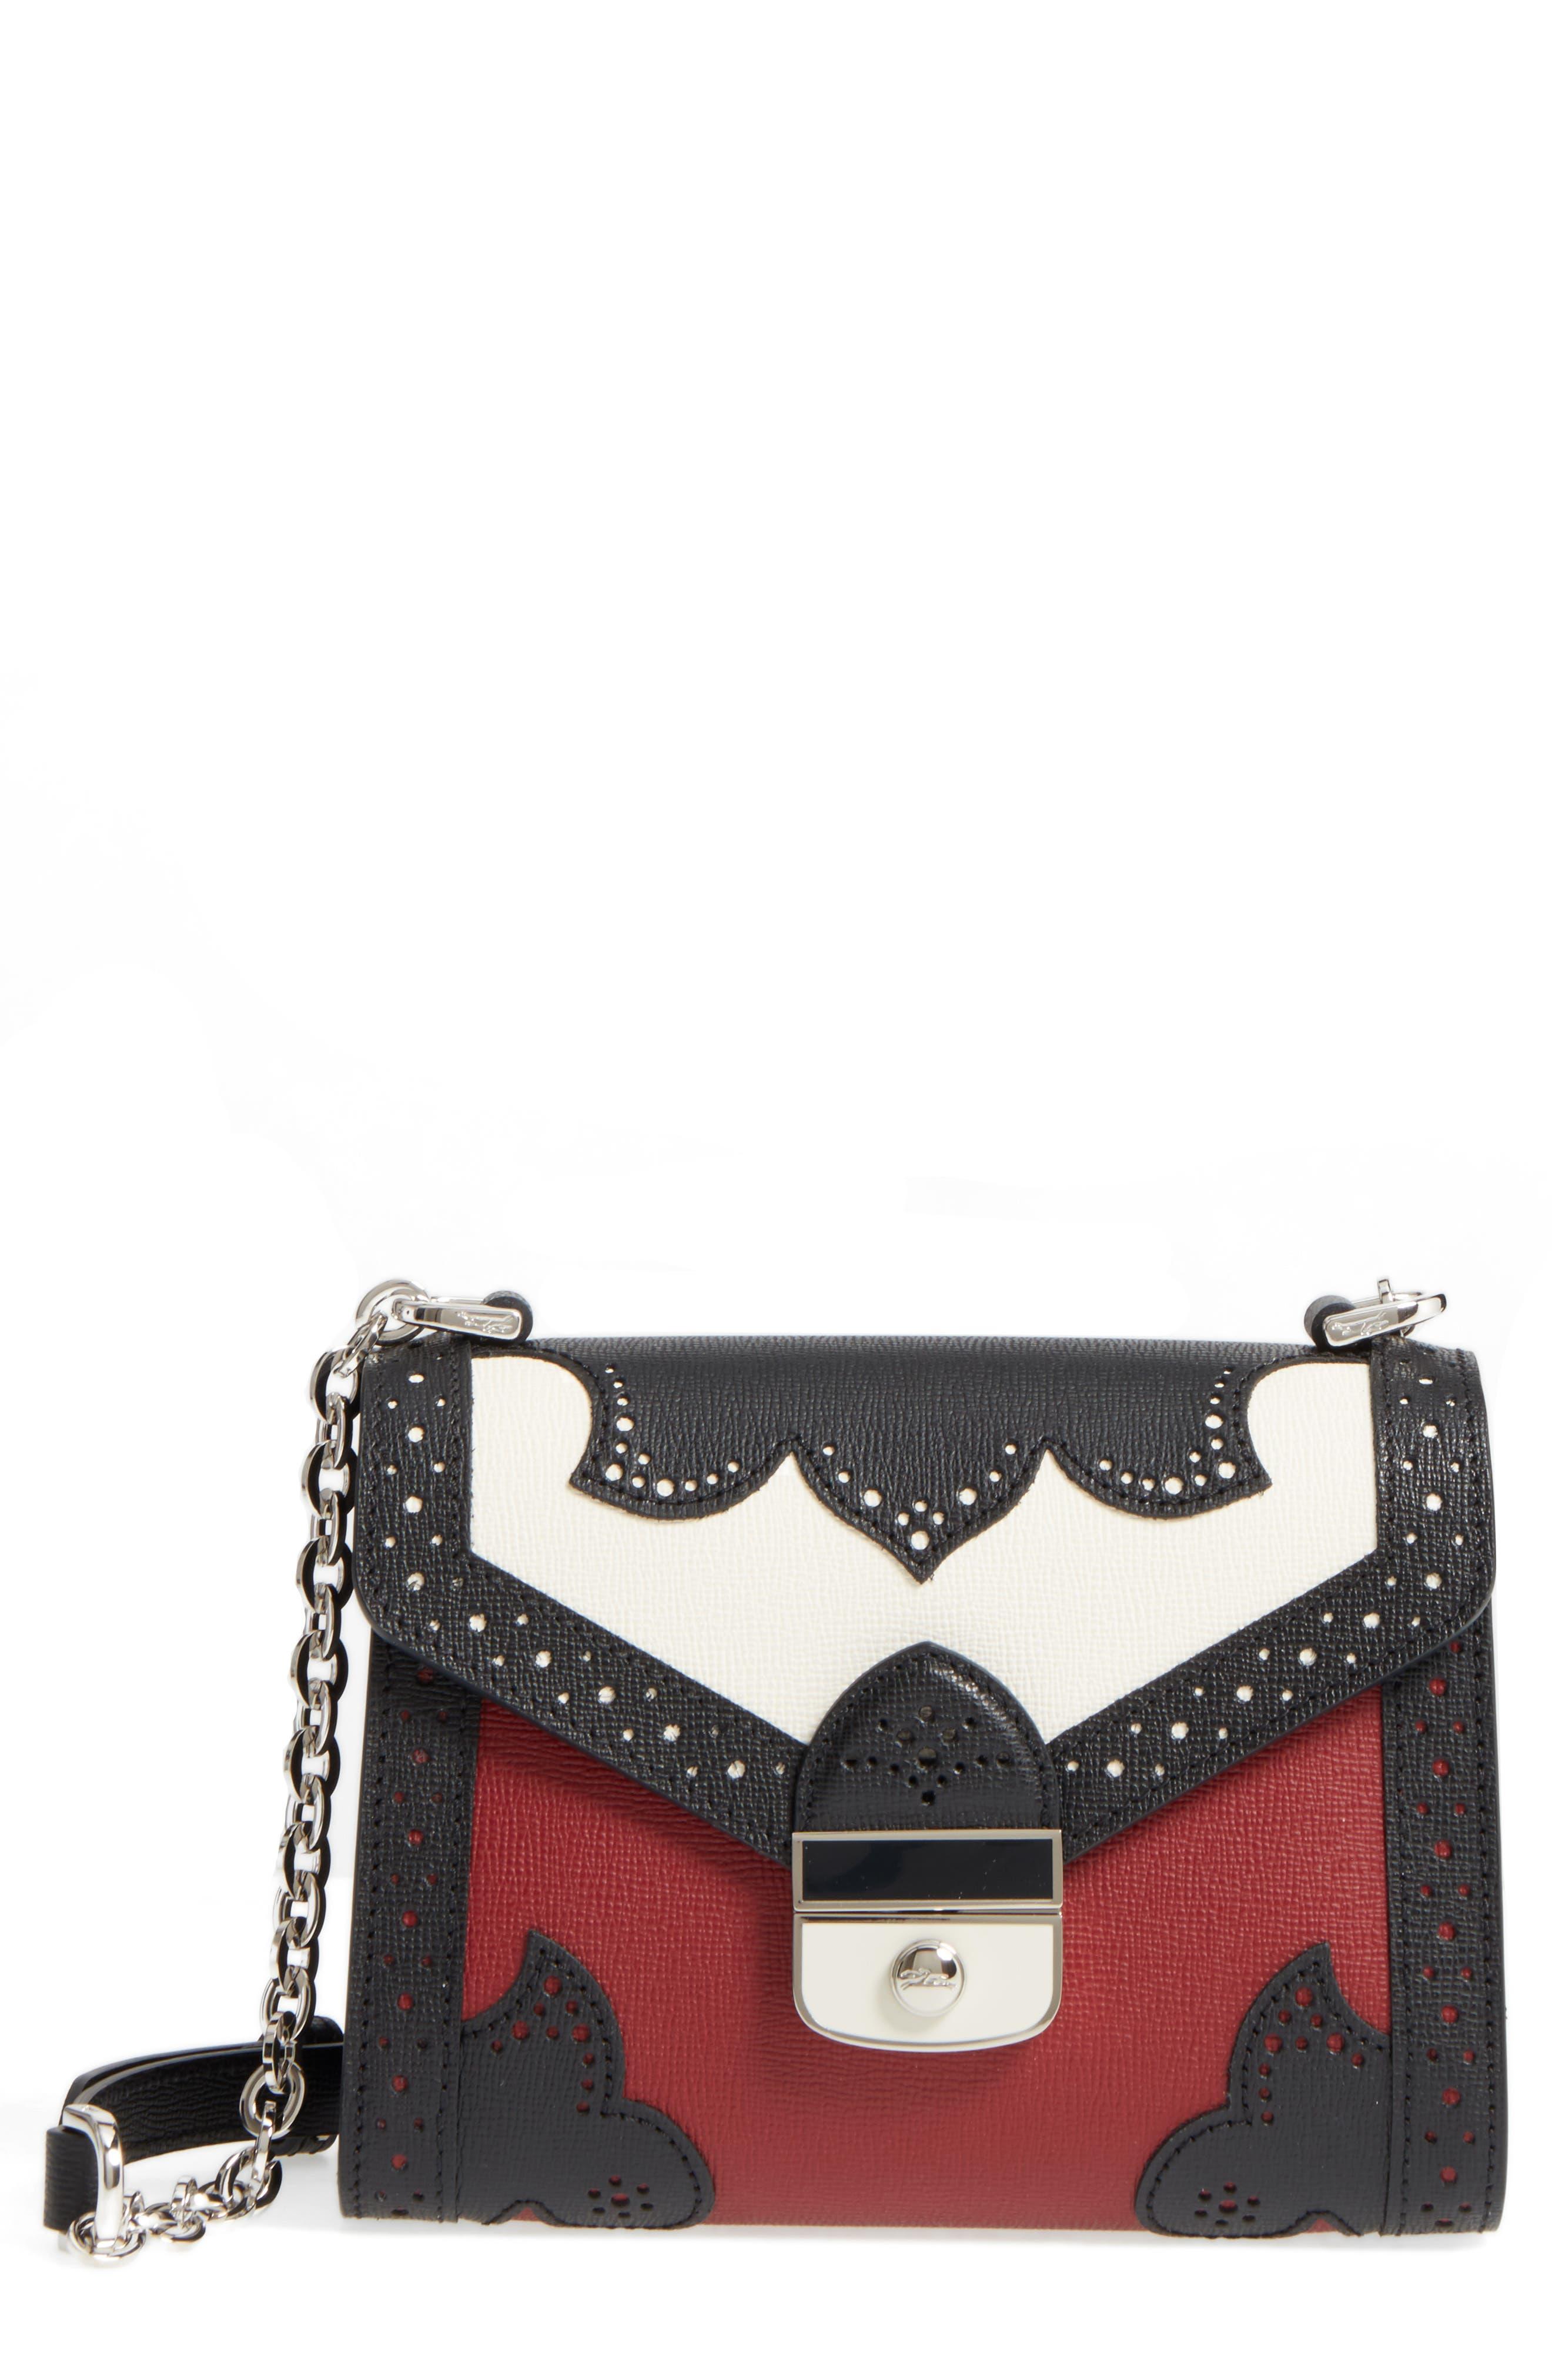 LONGCHAMP Effrontée Leather Crossbody Bag, Main, color, 618